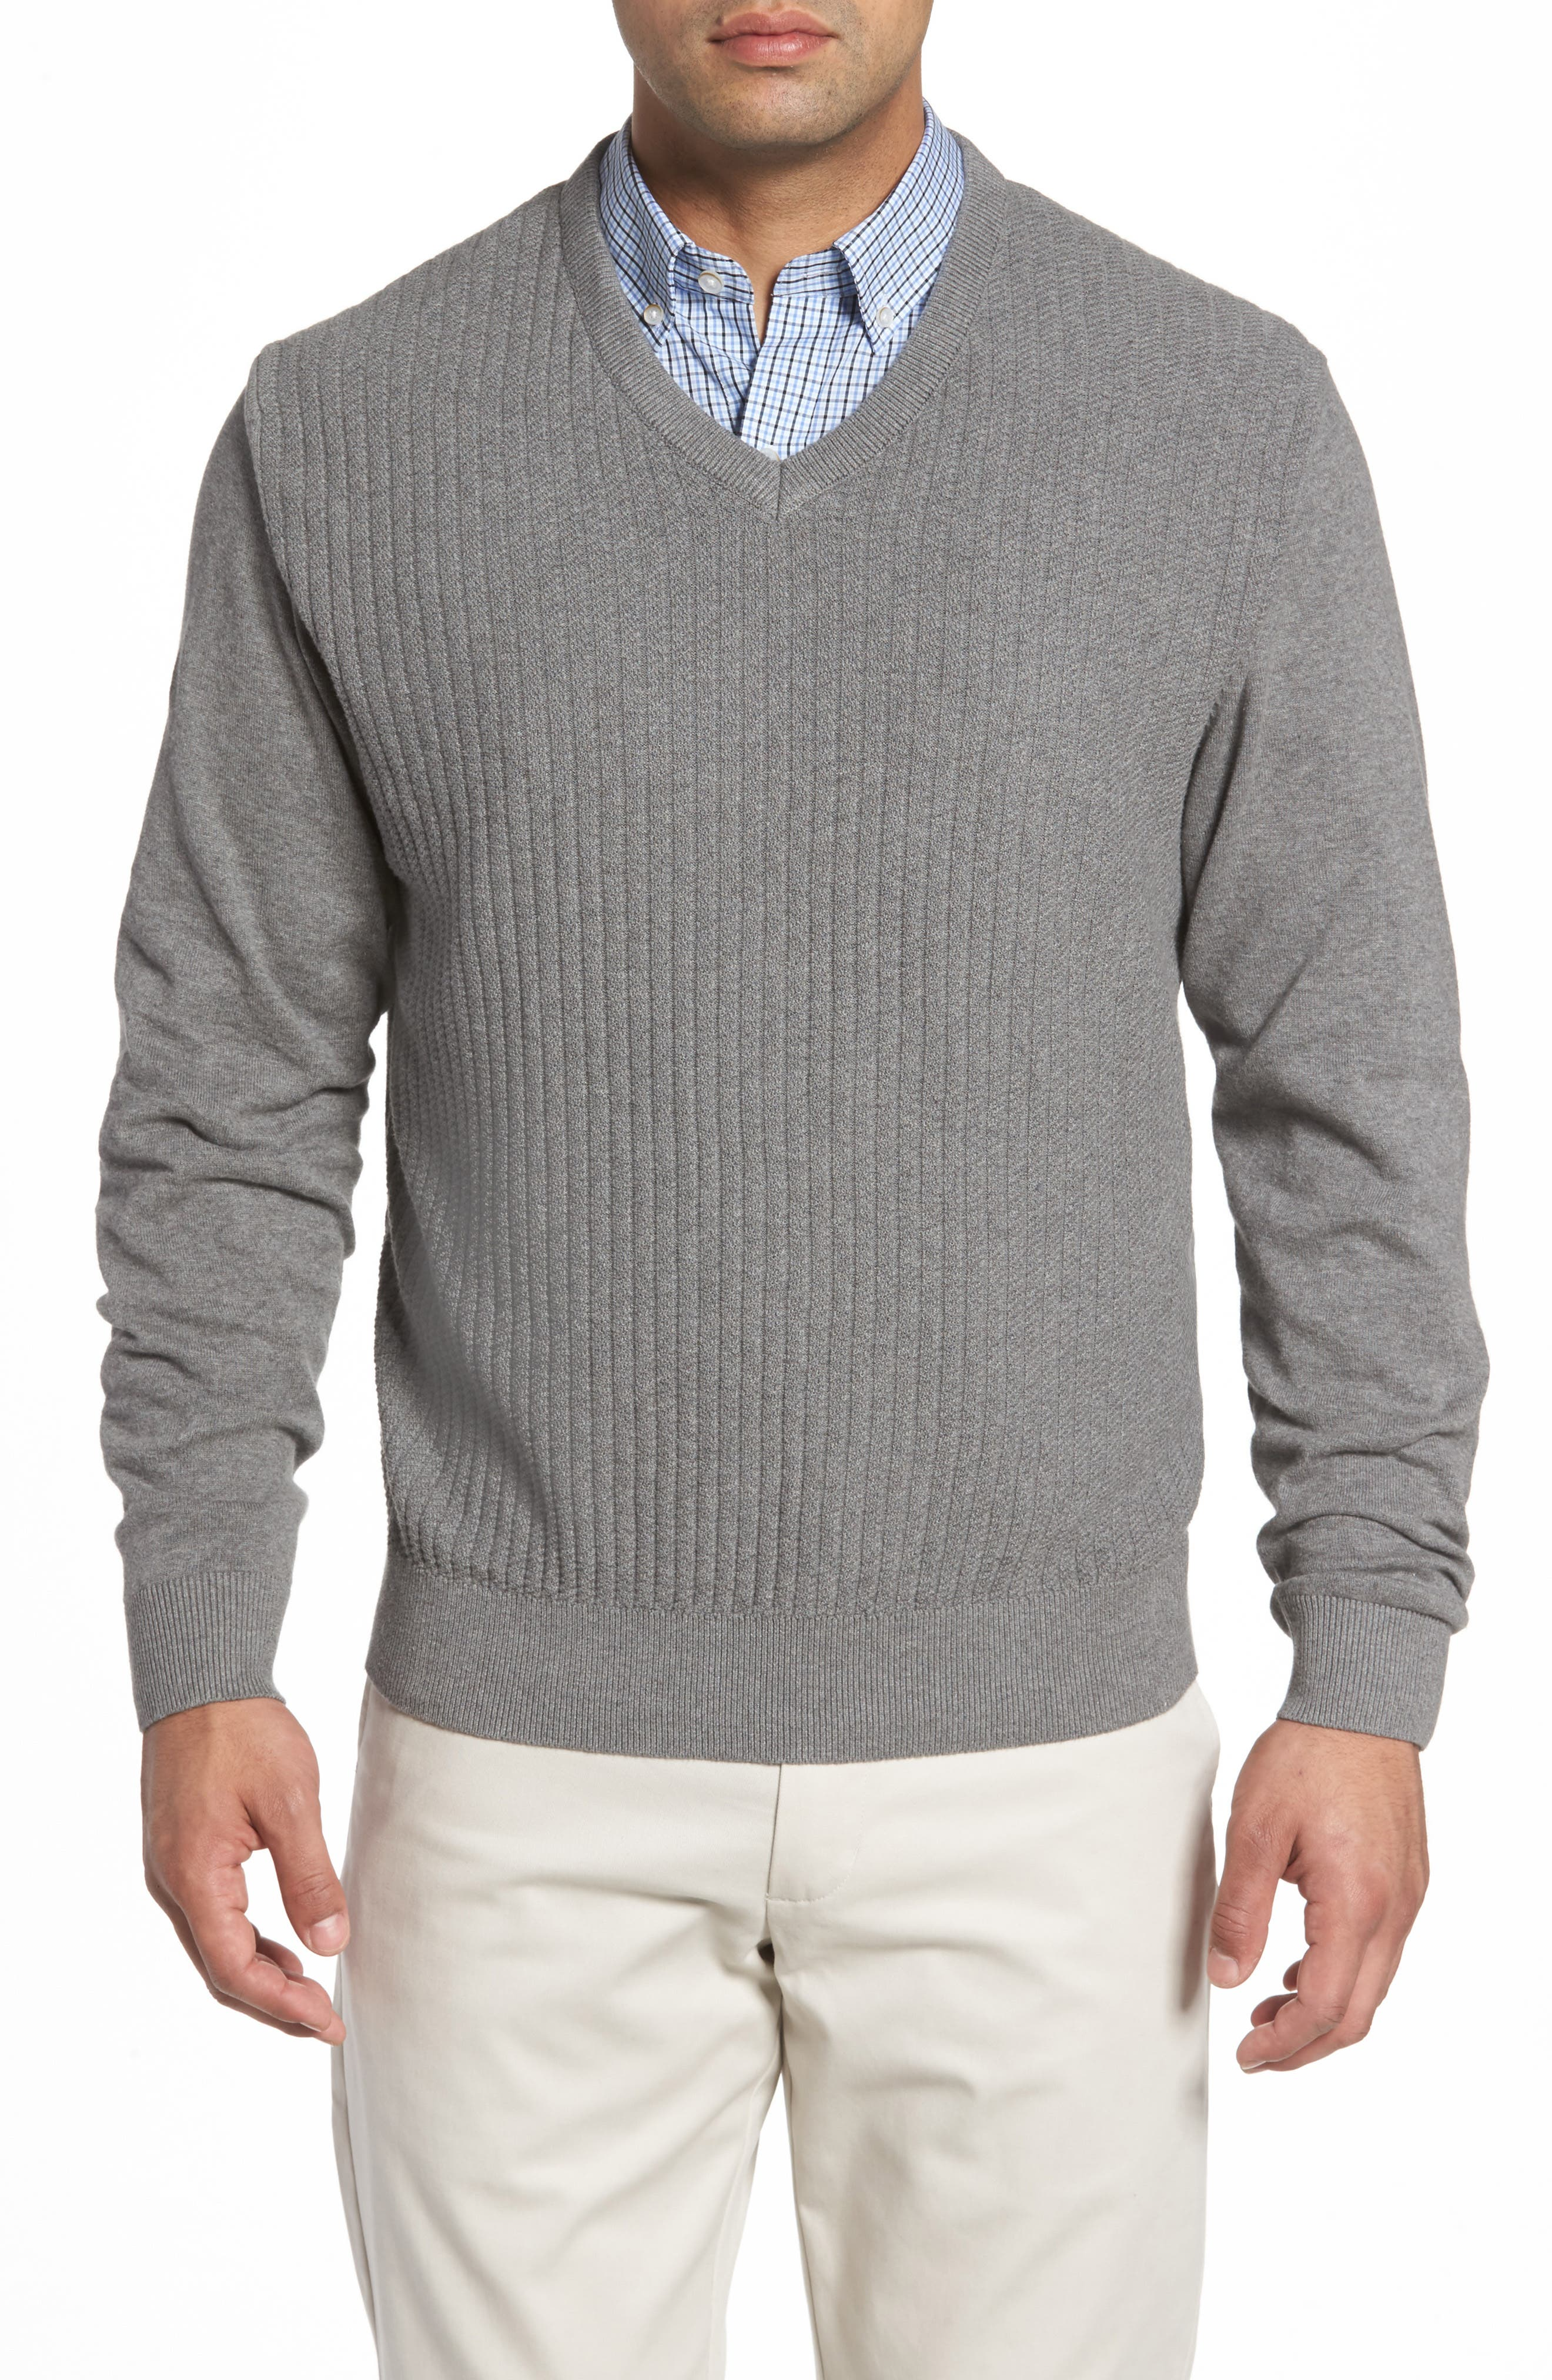 Main Image - Cutter & Buck Bryant Rib-Knit V-Neck Sweater